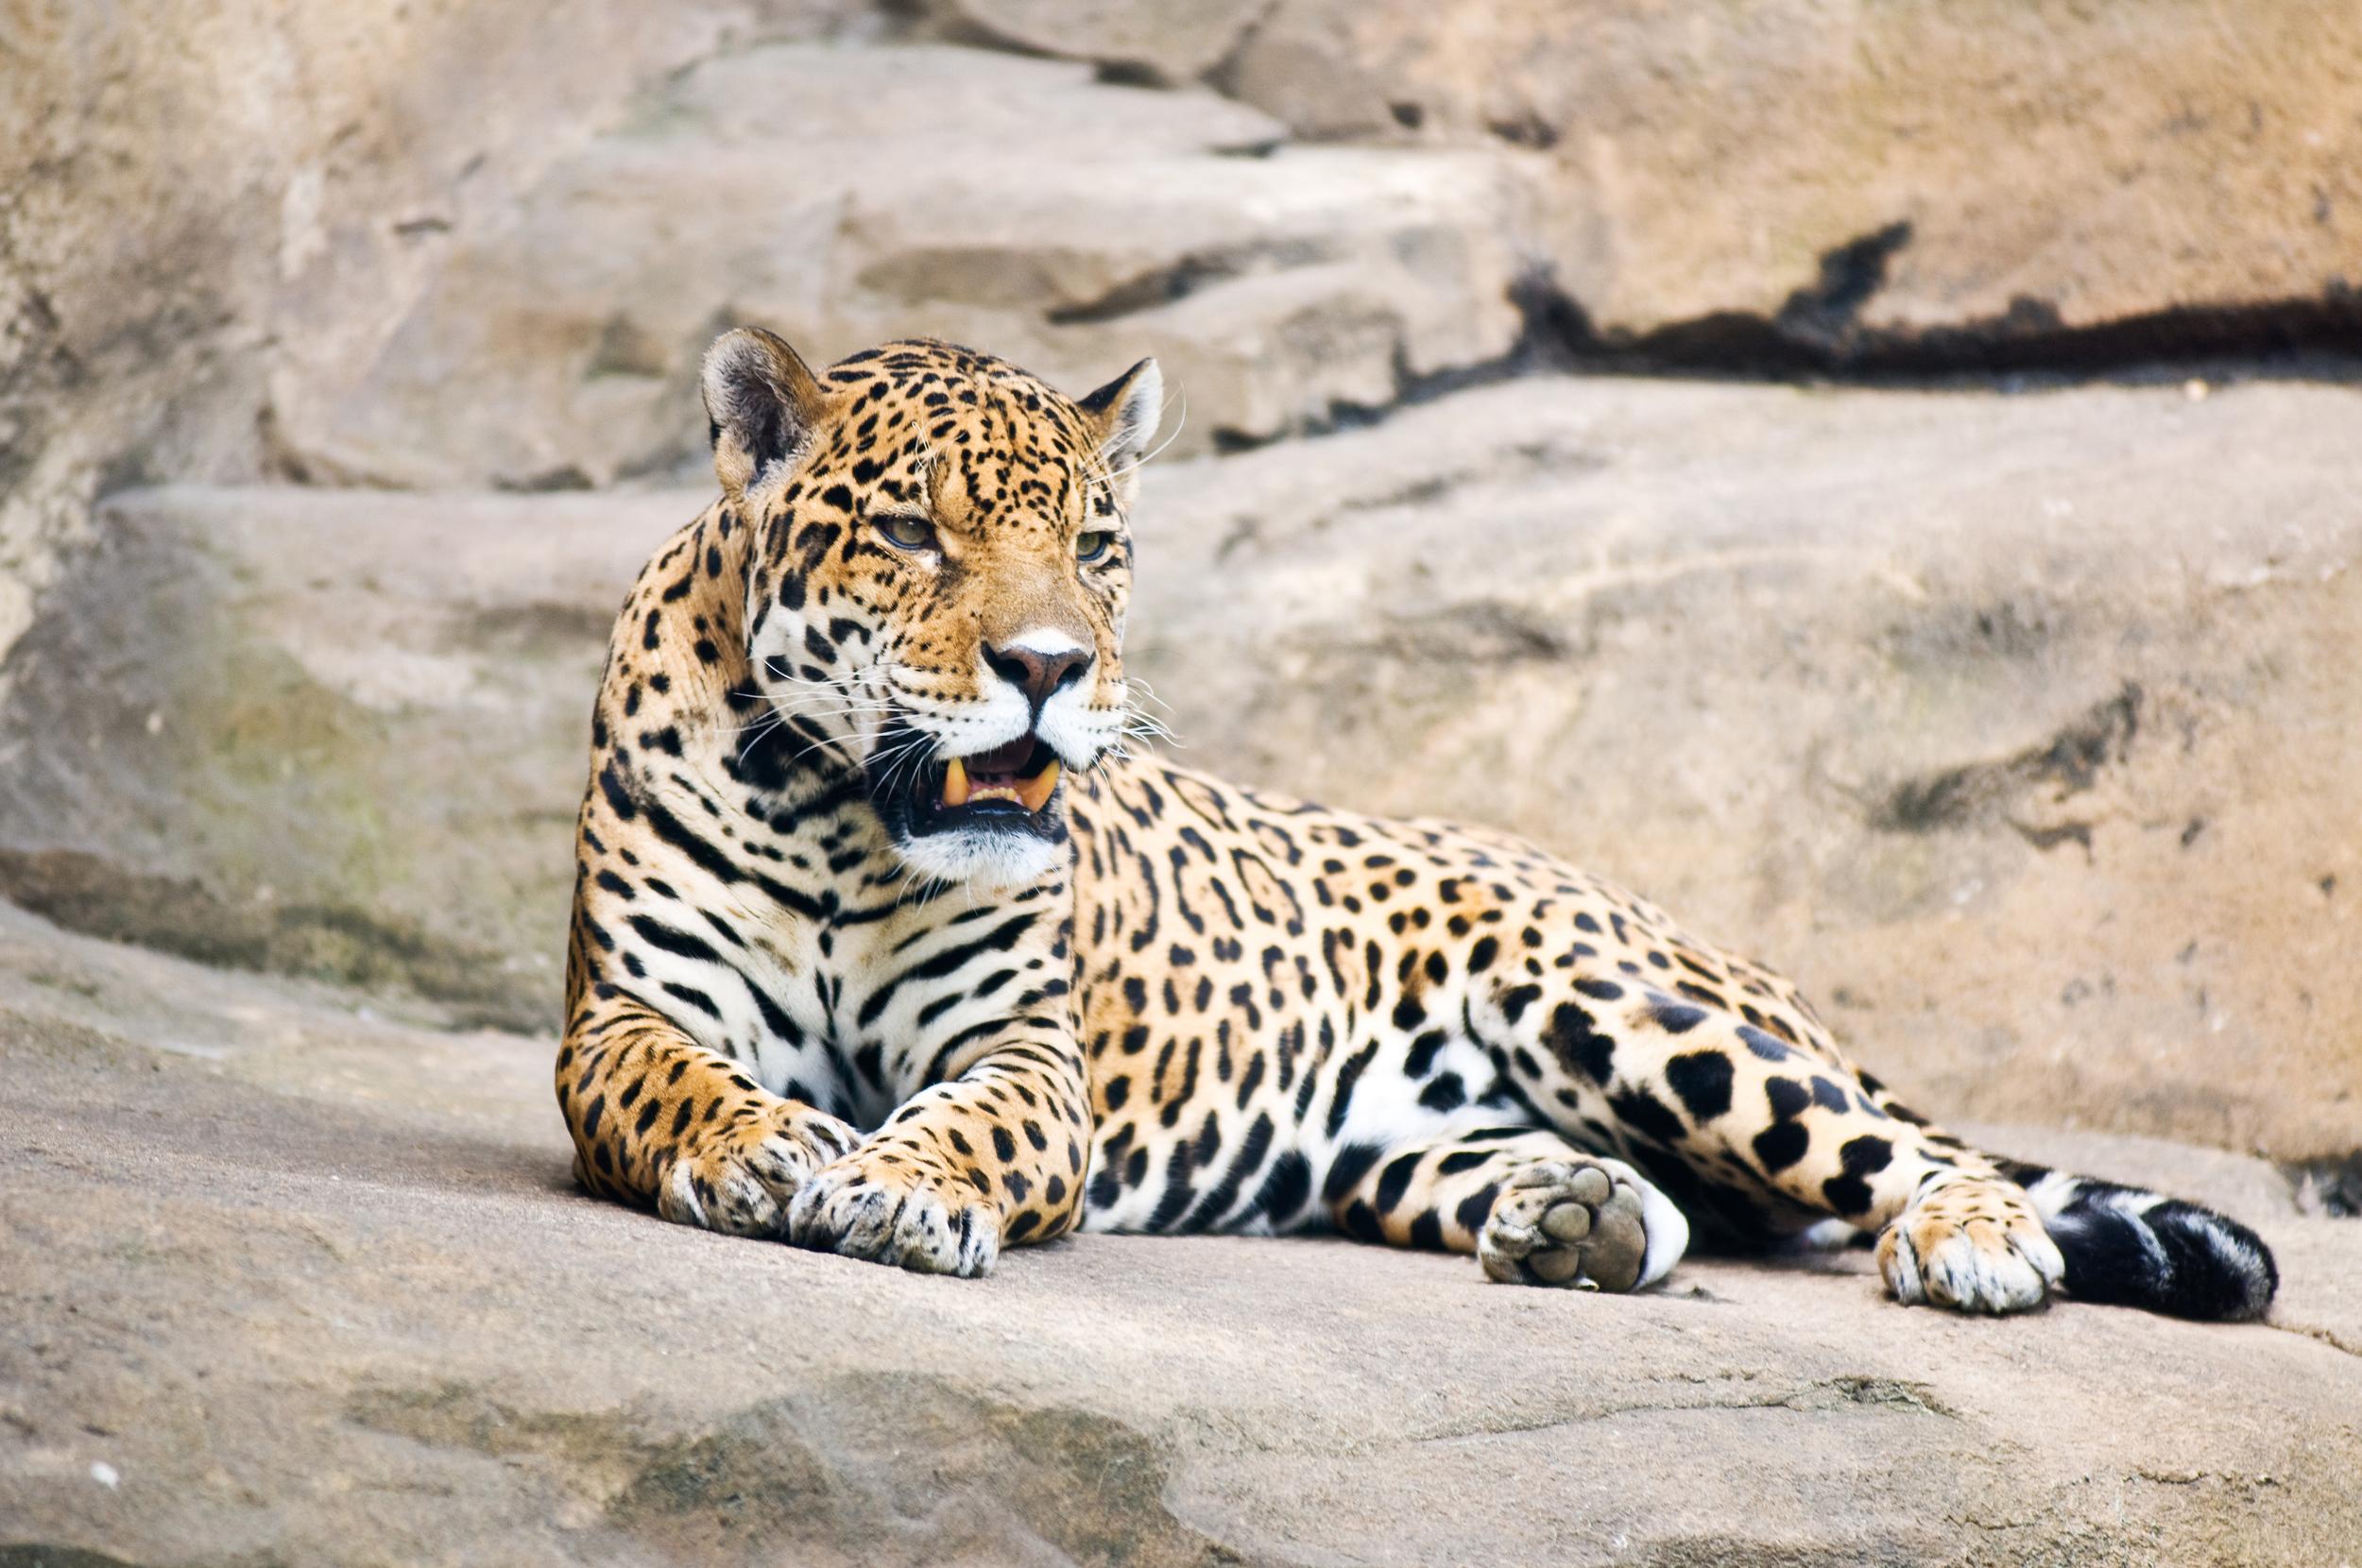 invite-to-paradise-sri-lanka-honeymoon-holiday-wildlife-leopard-safari-4.jpg